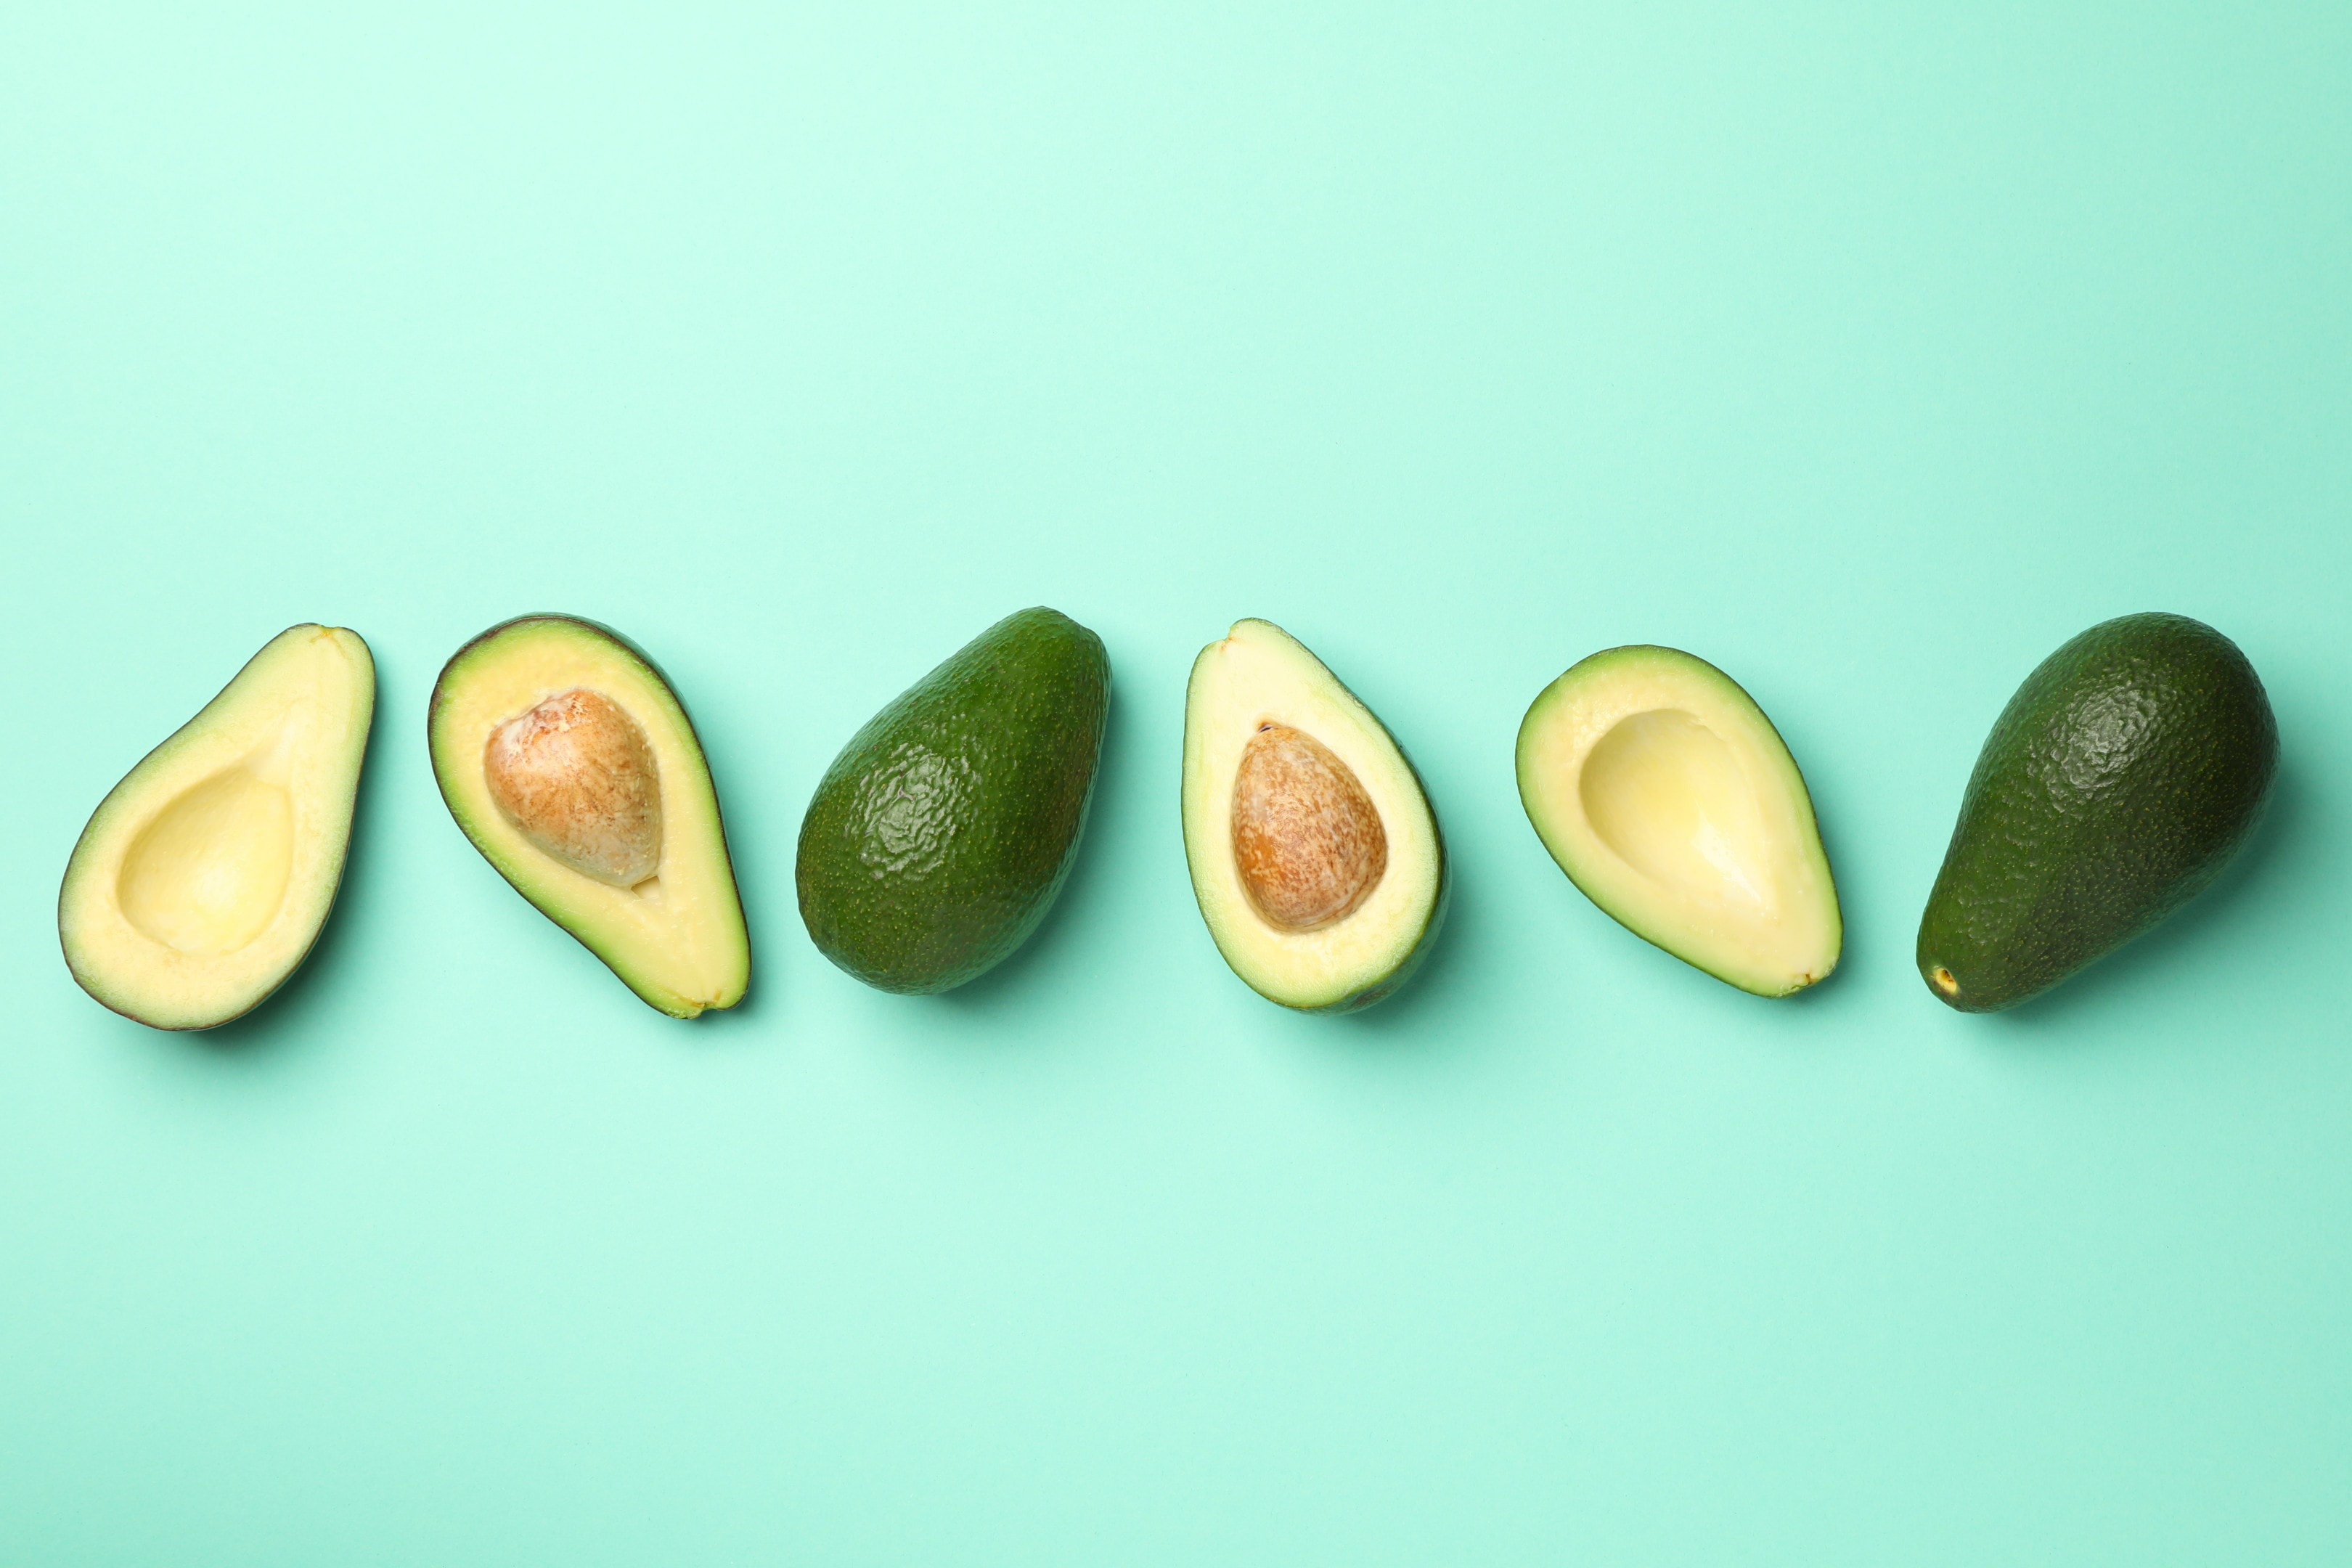 Ripe fresh avocado on mint background